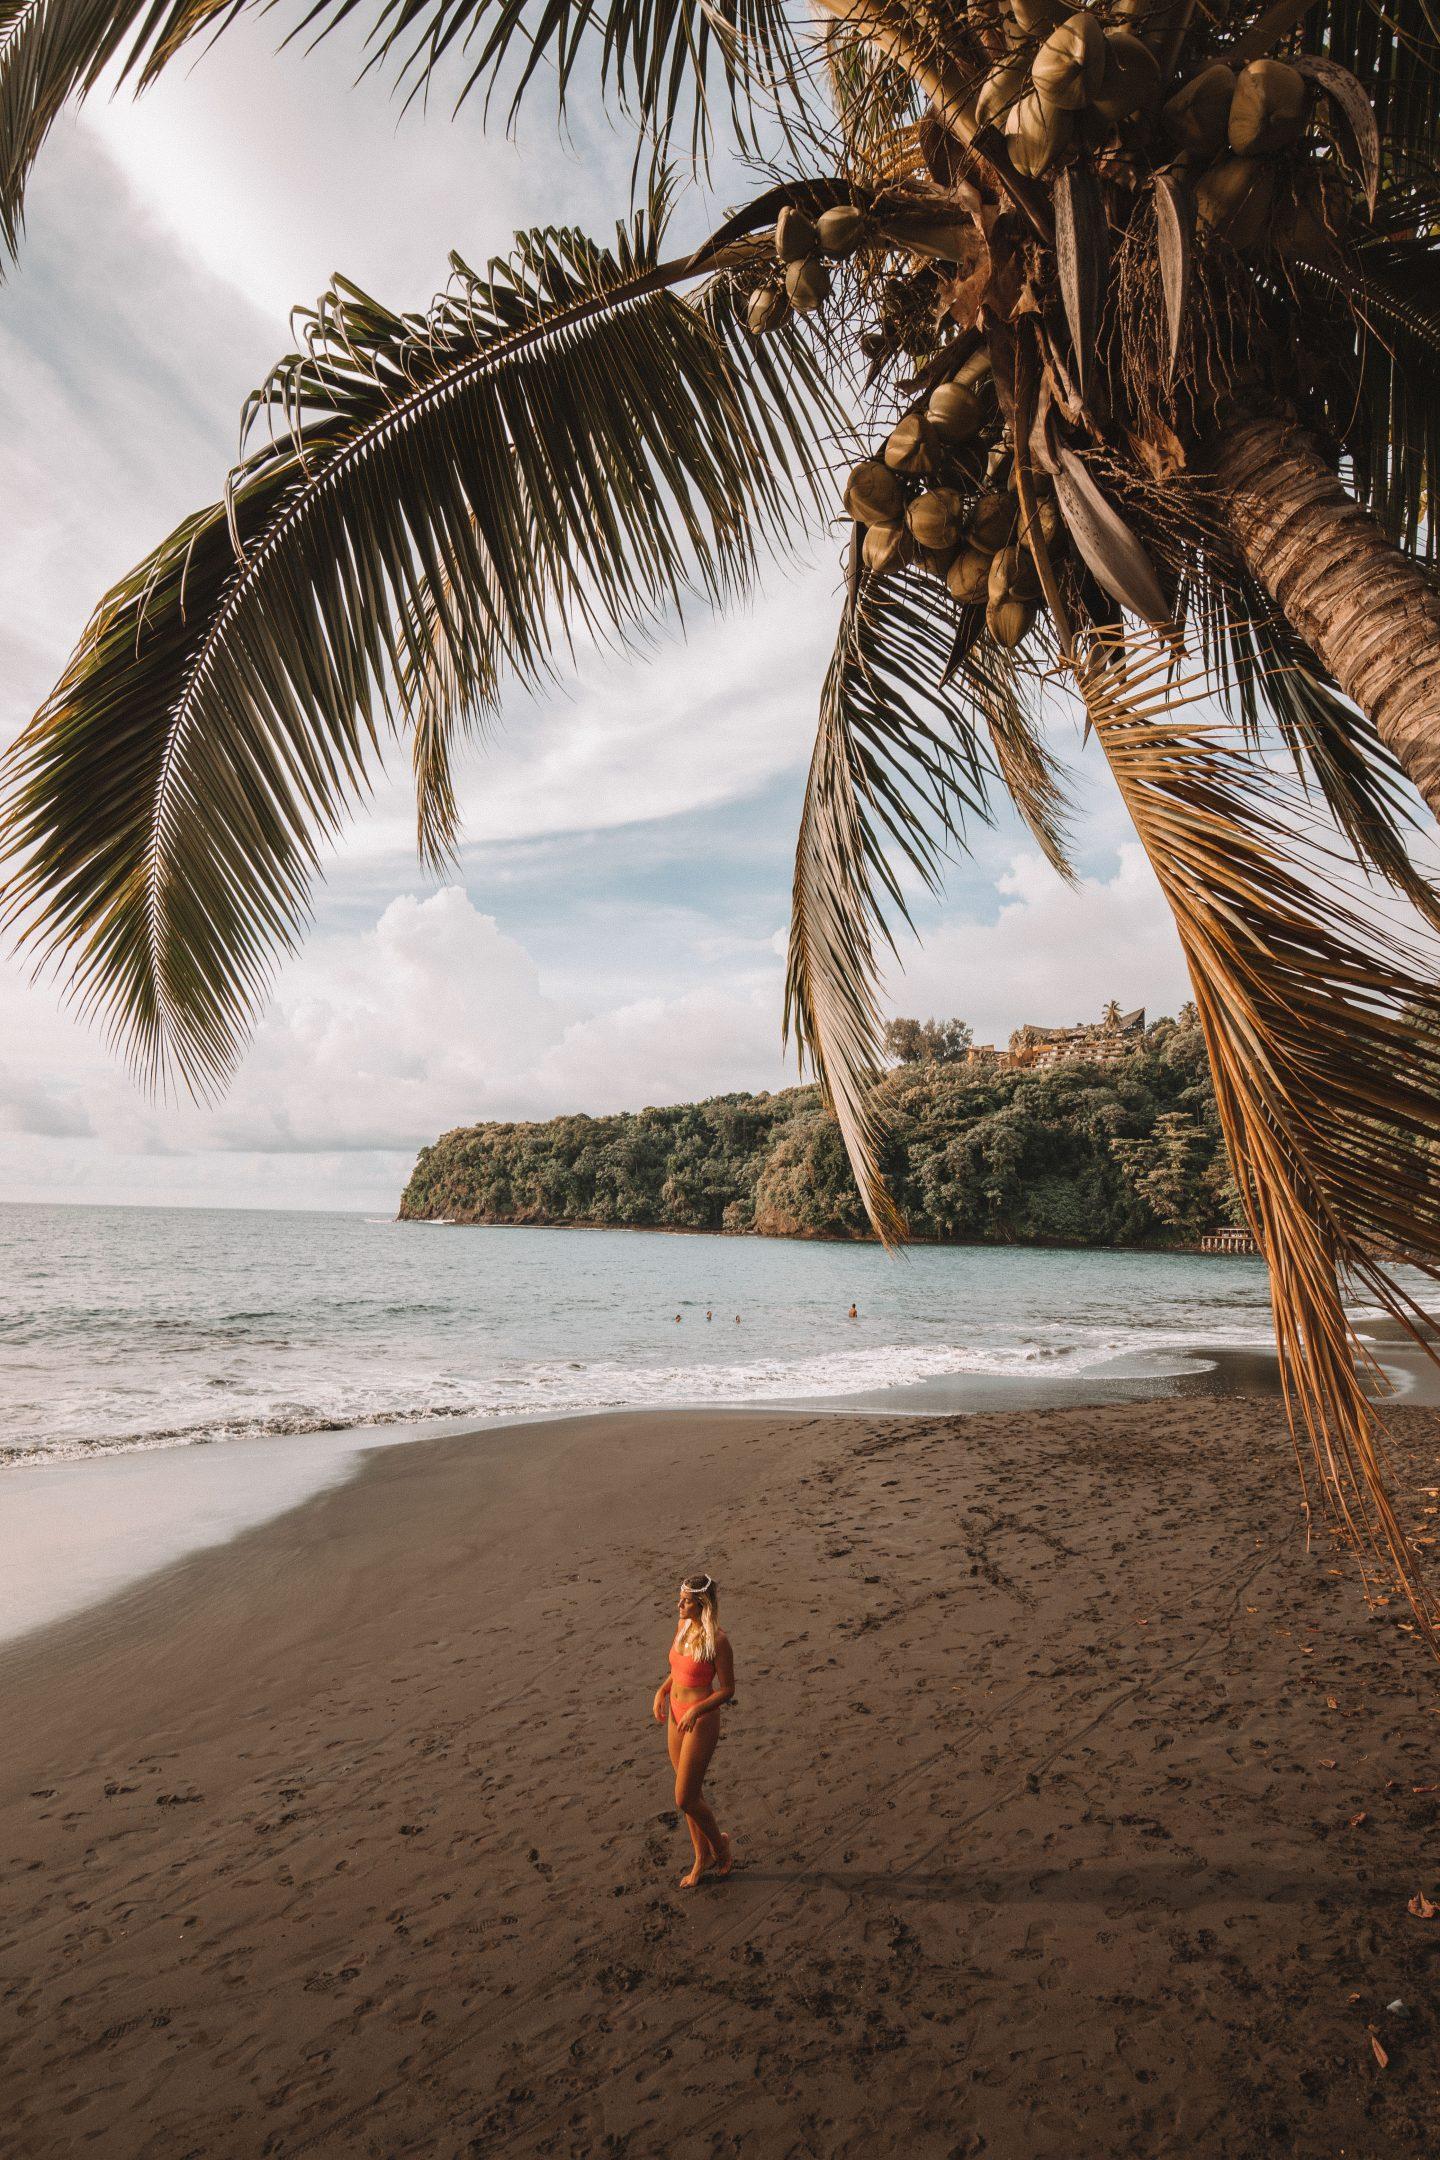 Plage noire Tahiti - Blondie Baby blog voyages et mode